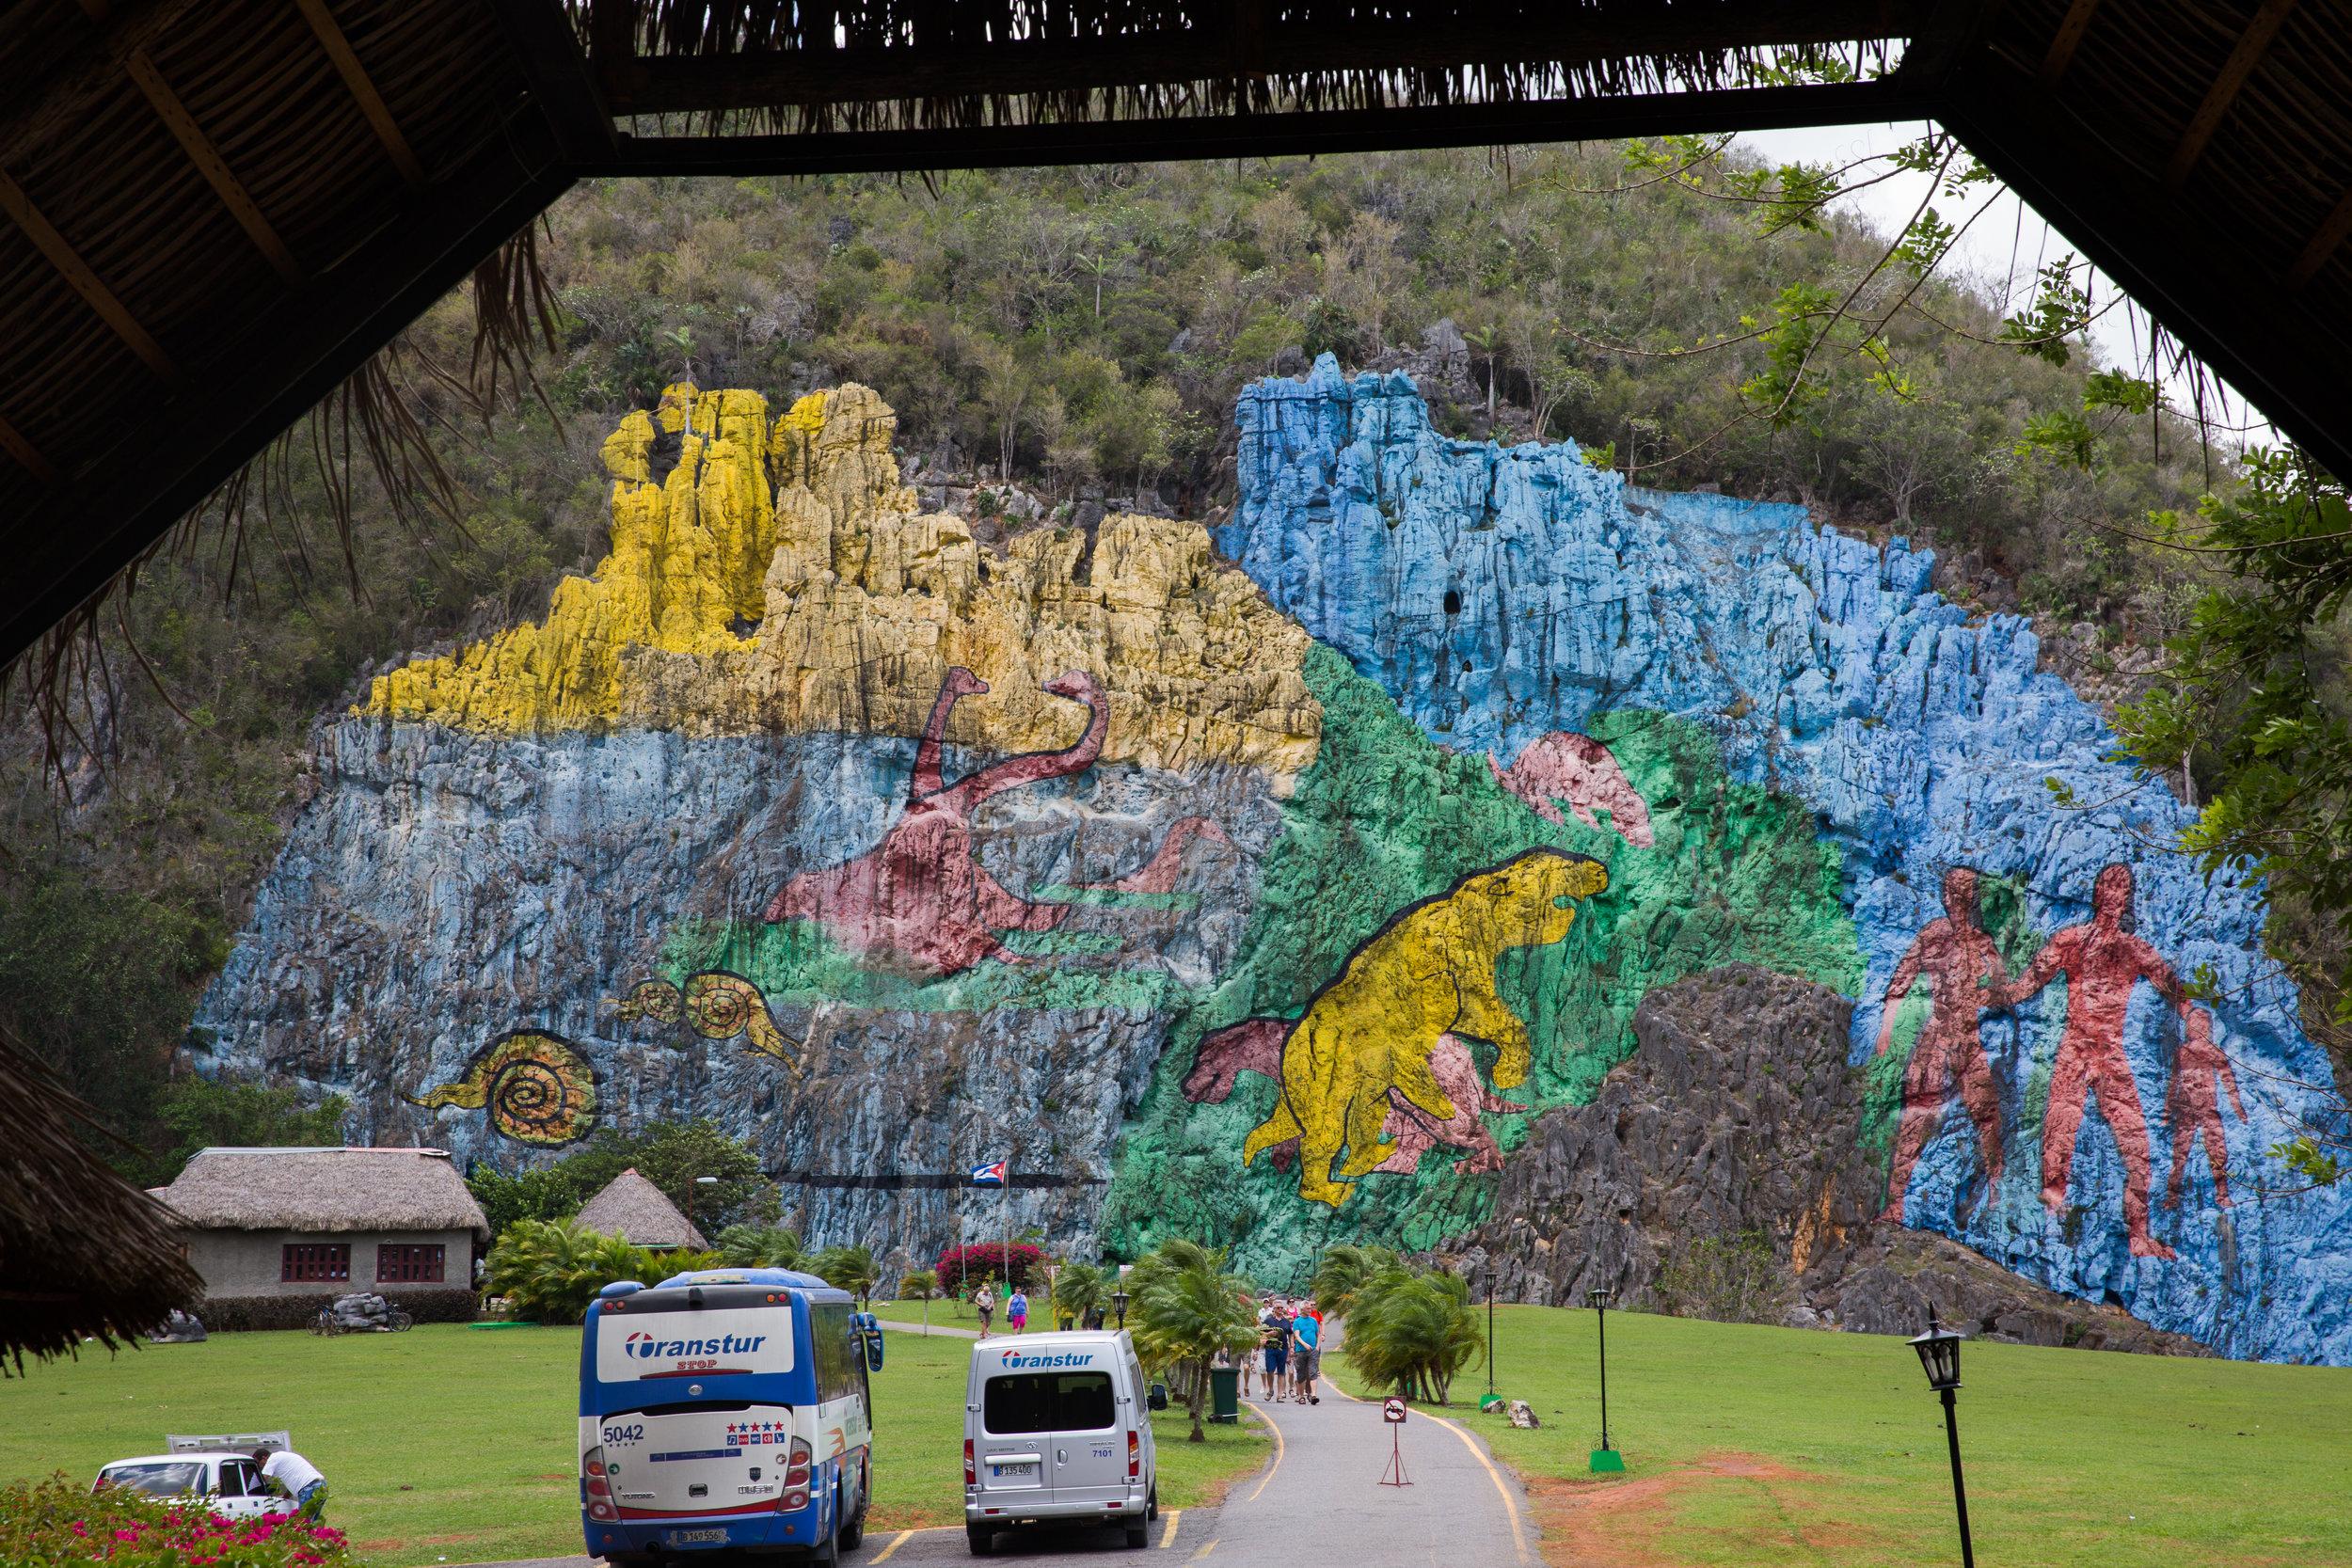 The Mural de la Prehistoria walks us through a chart of evolution in vivid color.